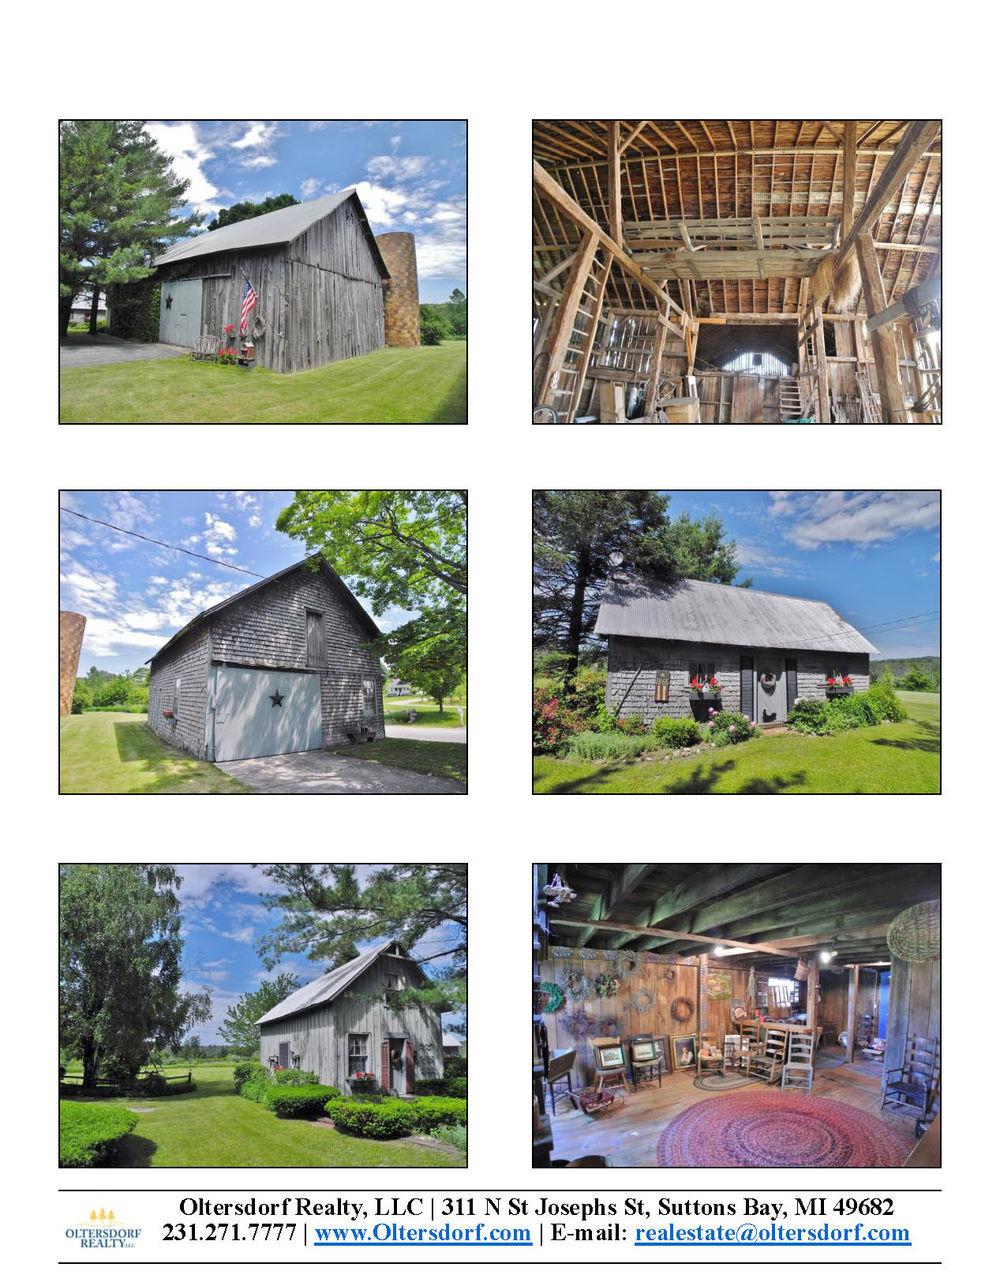 7251 E Alpers Road, Lake Leelanau, MI – Historic 1865 Centennial Inn For Sale By Oltersdorf Realty LLC Information Packet (4).jpg